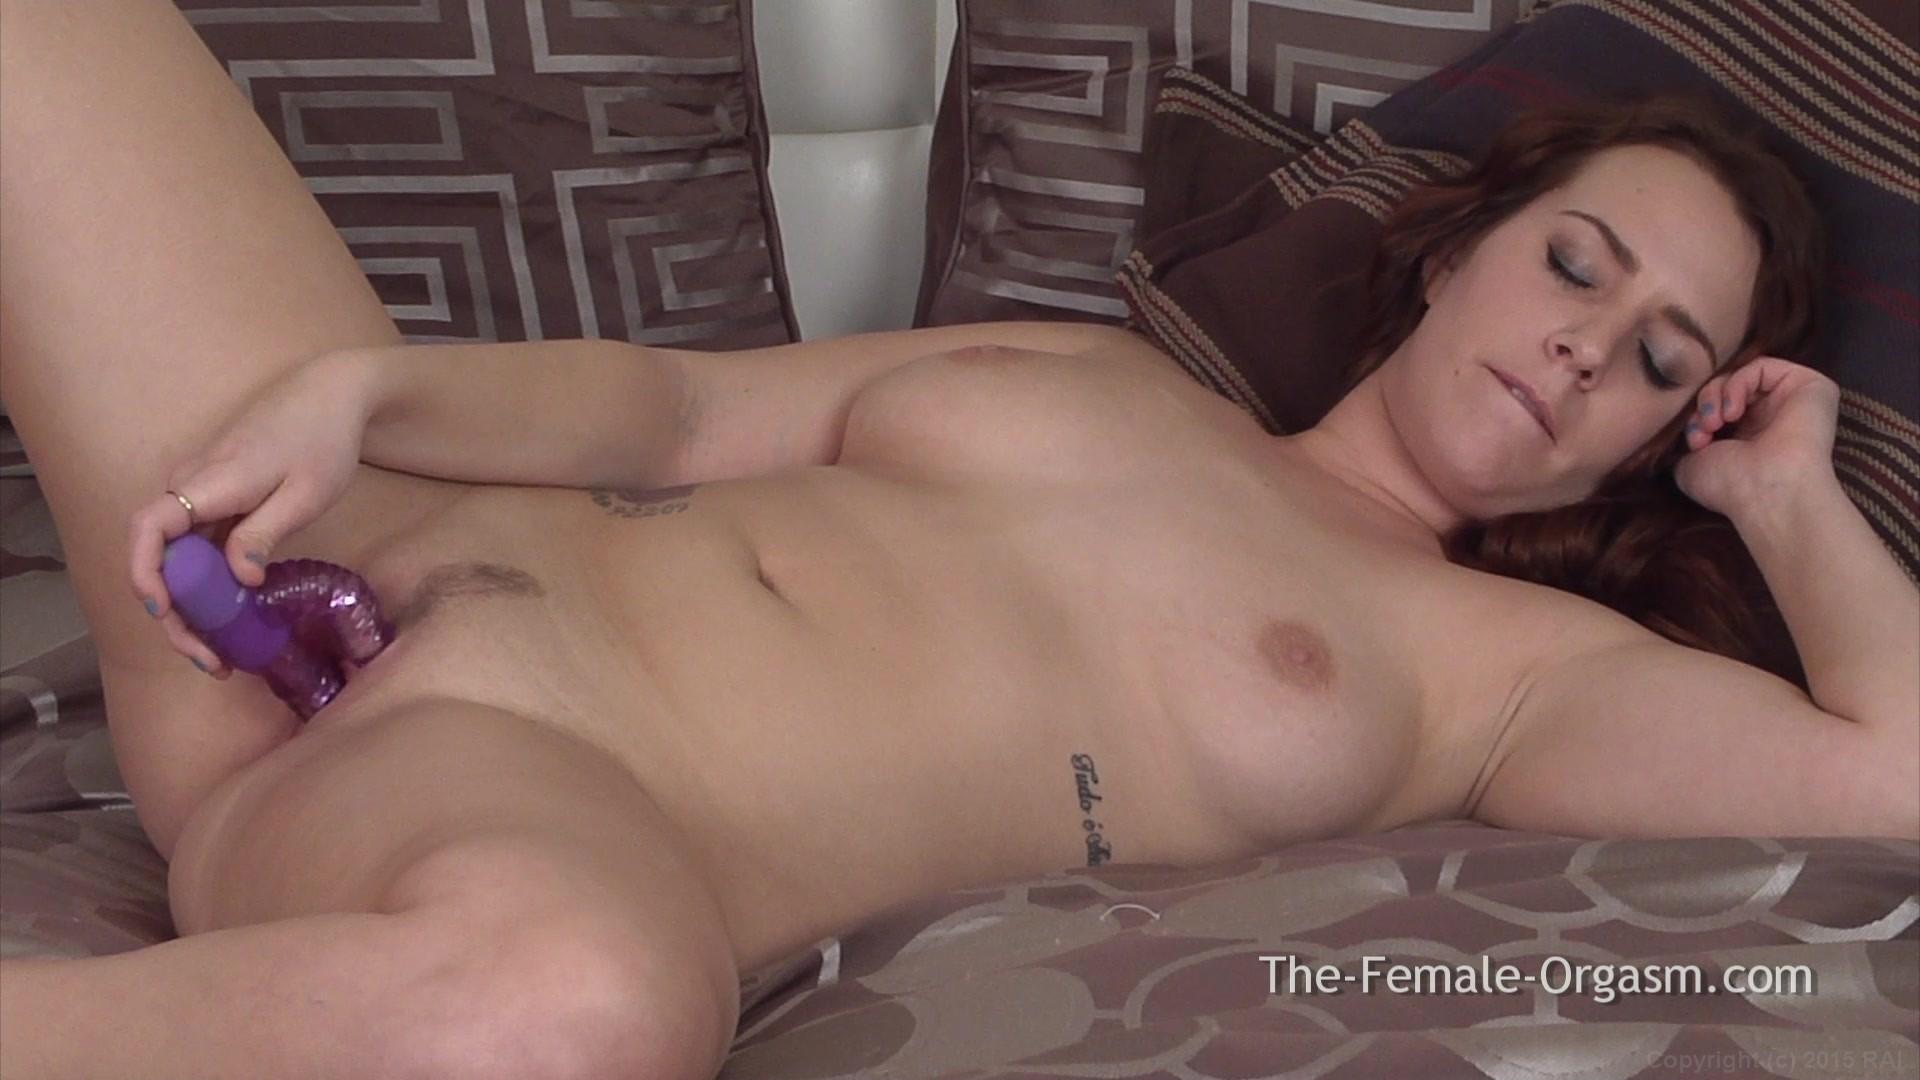 Alisha Willett